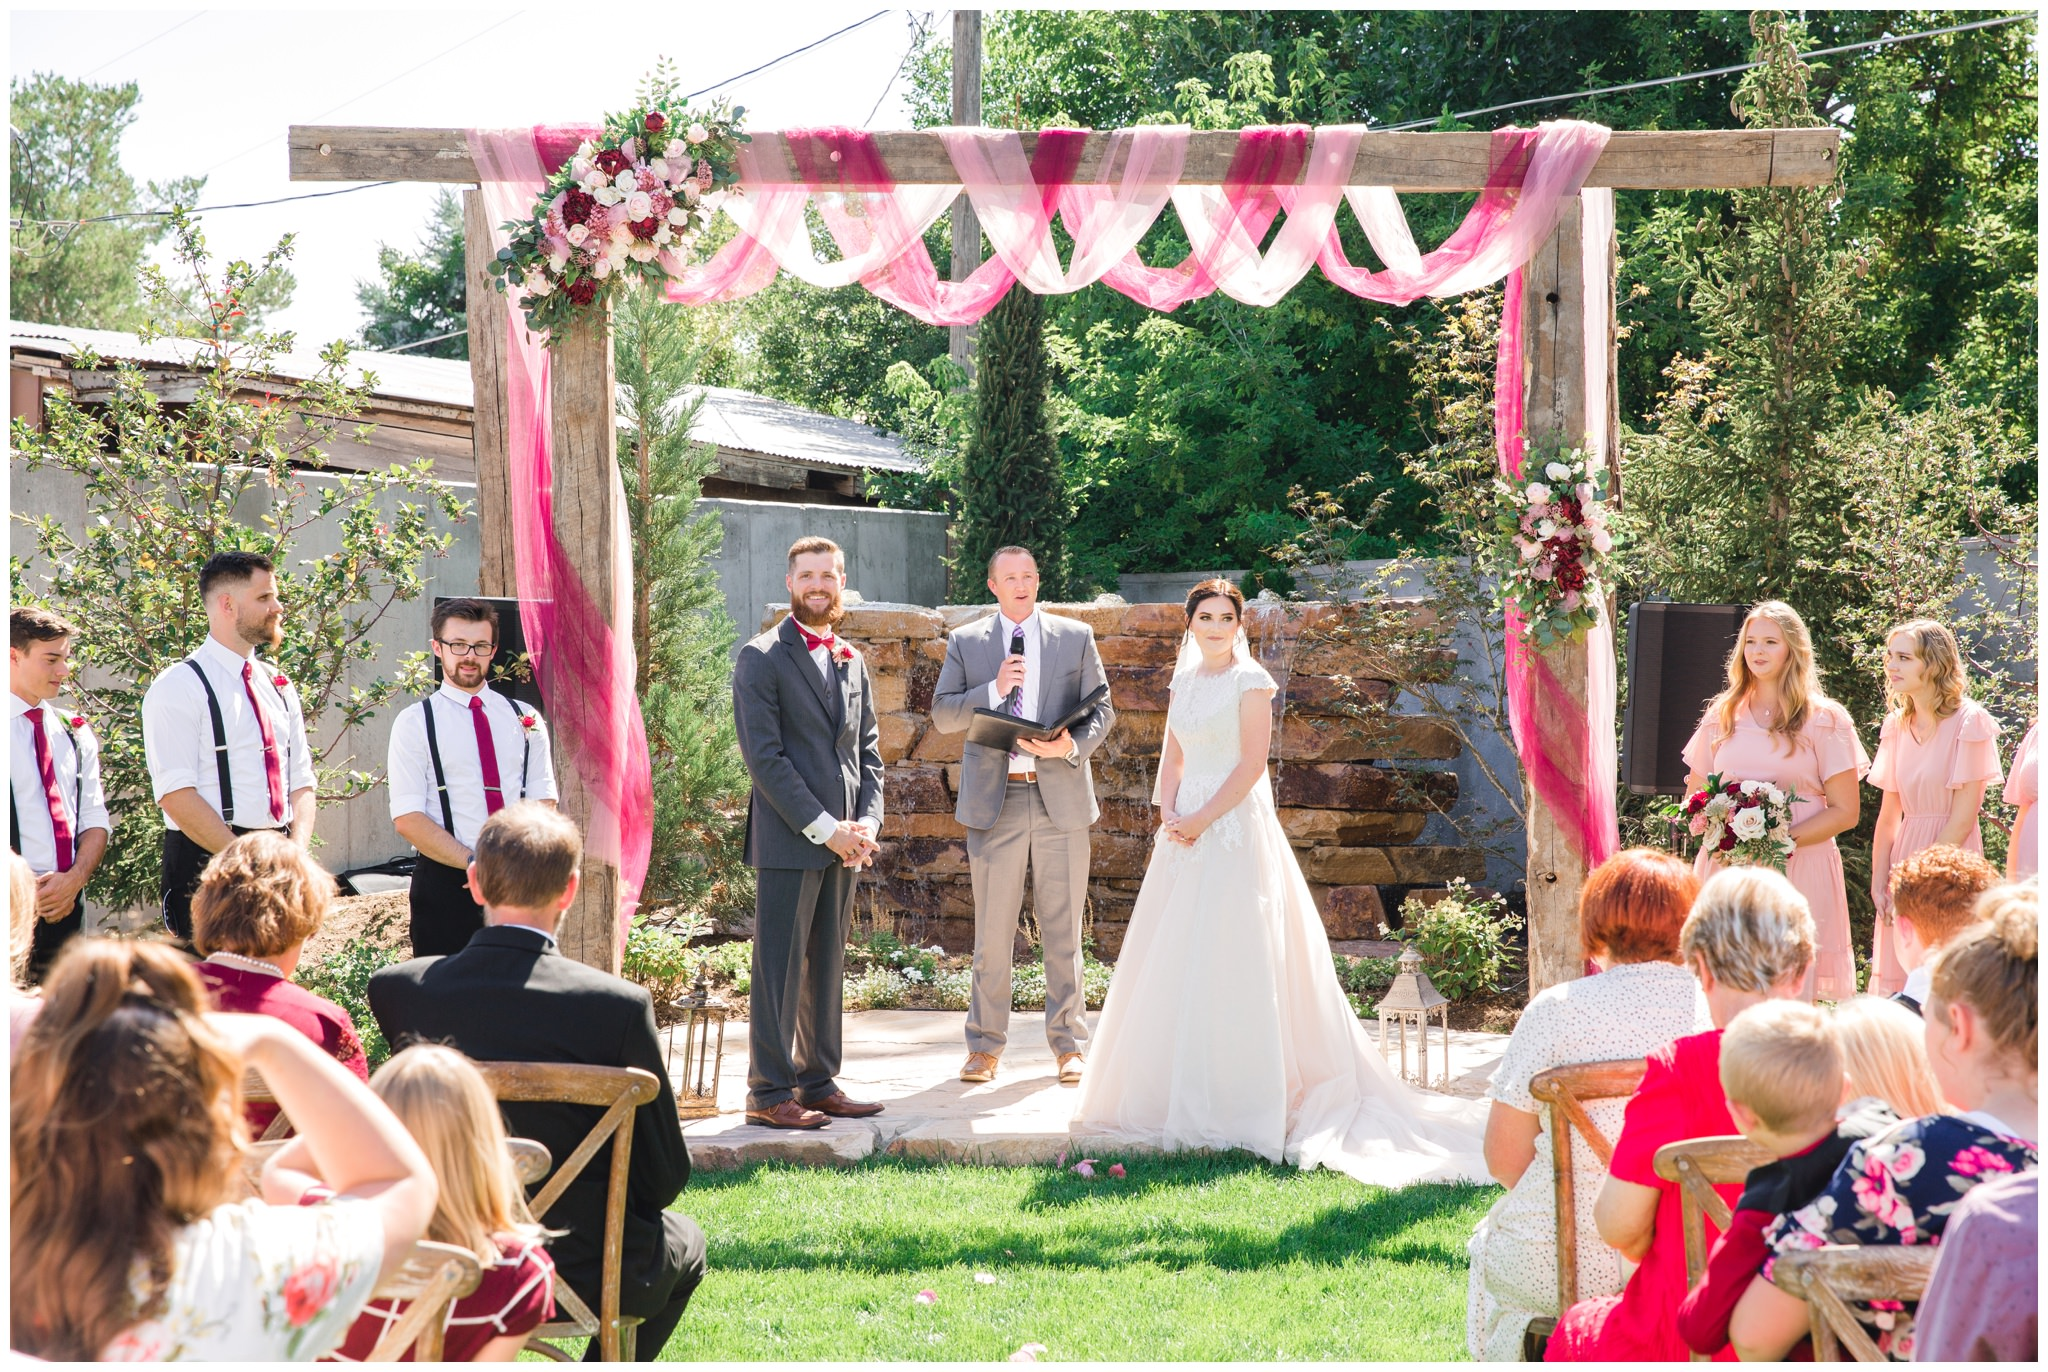 Summer wedding ceremony at the Wild Oak Venue in Lindon, Utah. Burgundy floral arrangement on arch above bride and groom.